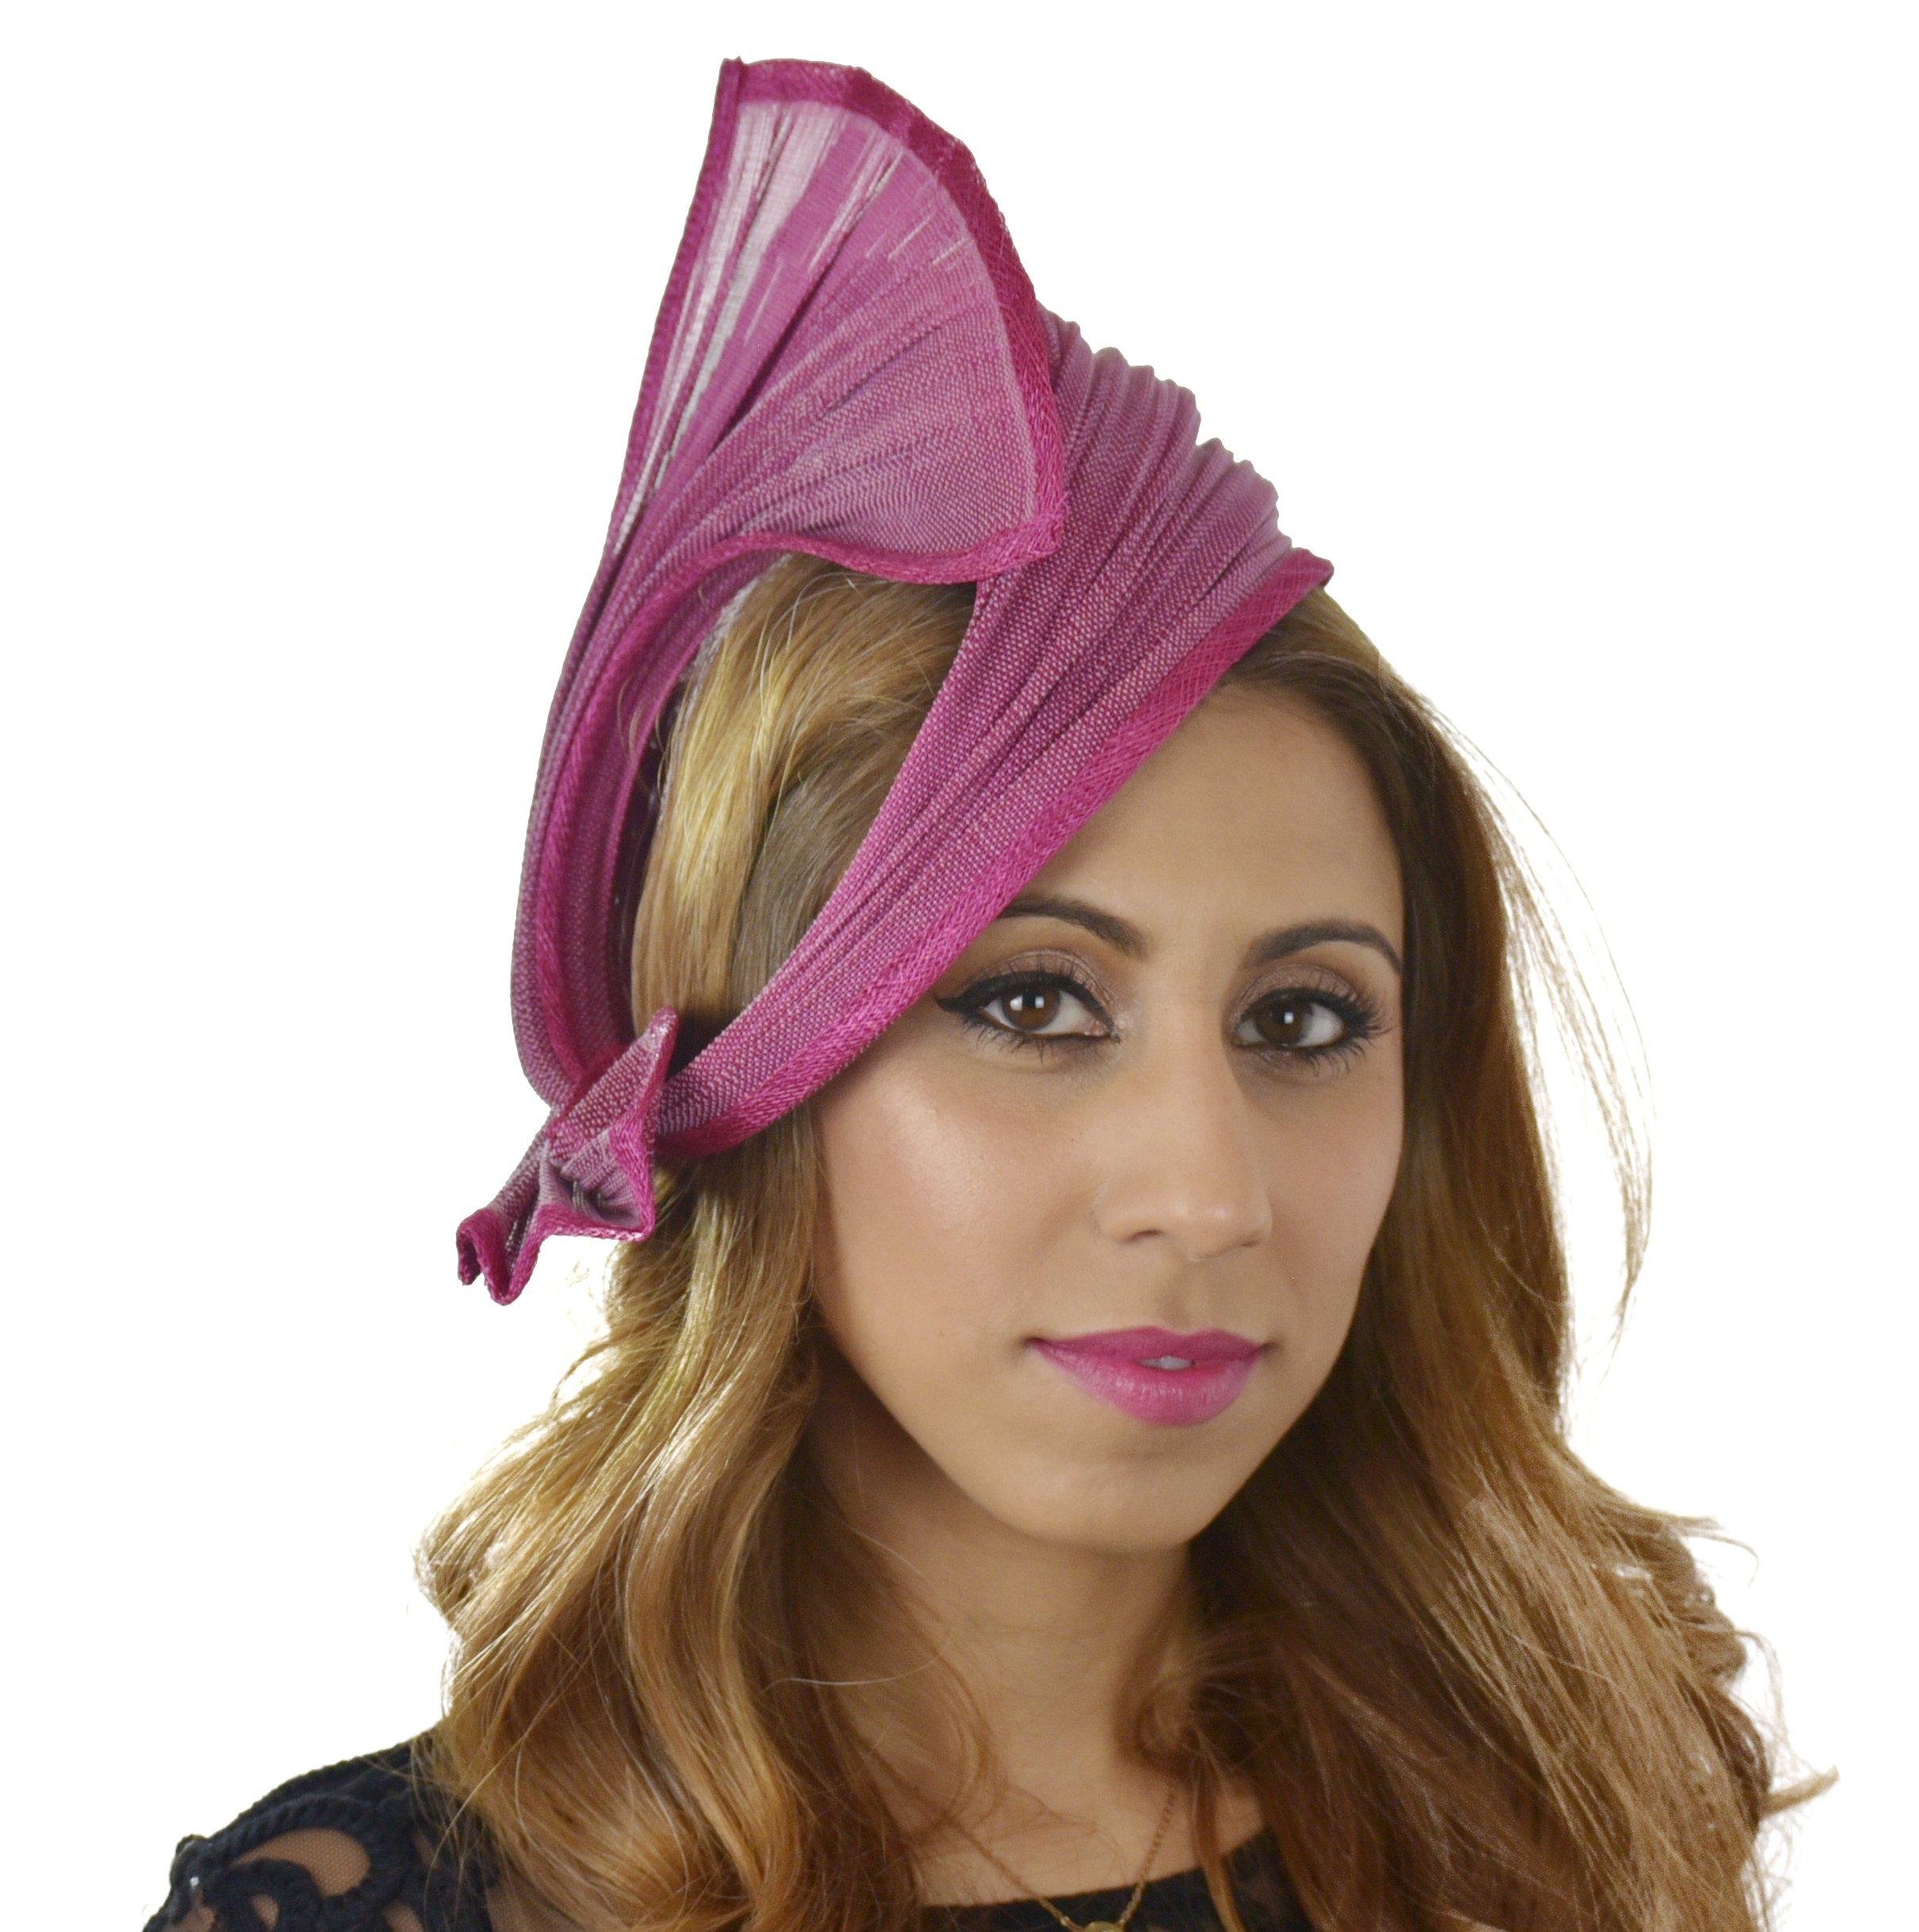 Hats By Cressida Ladies Wedding Races Ascot Derby Fascinator Headband Fuchsia by Hats By Cressida